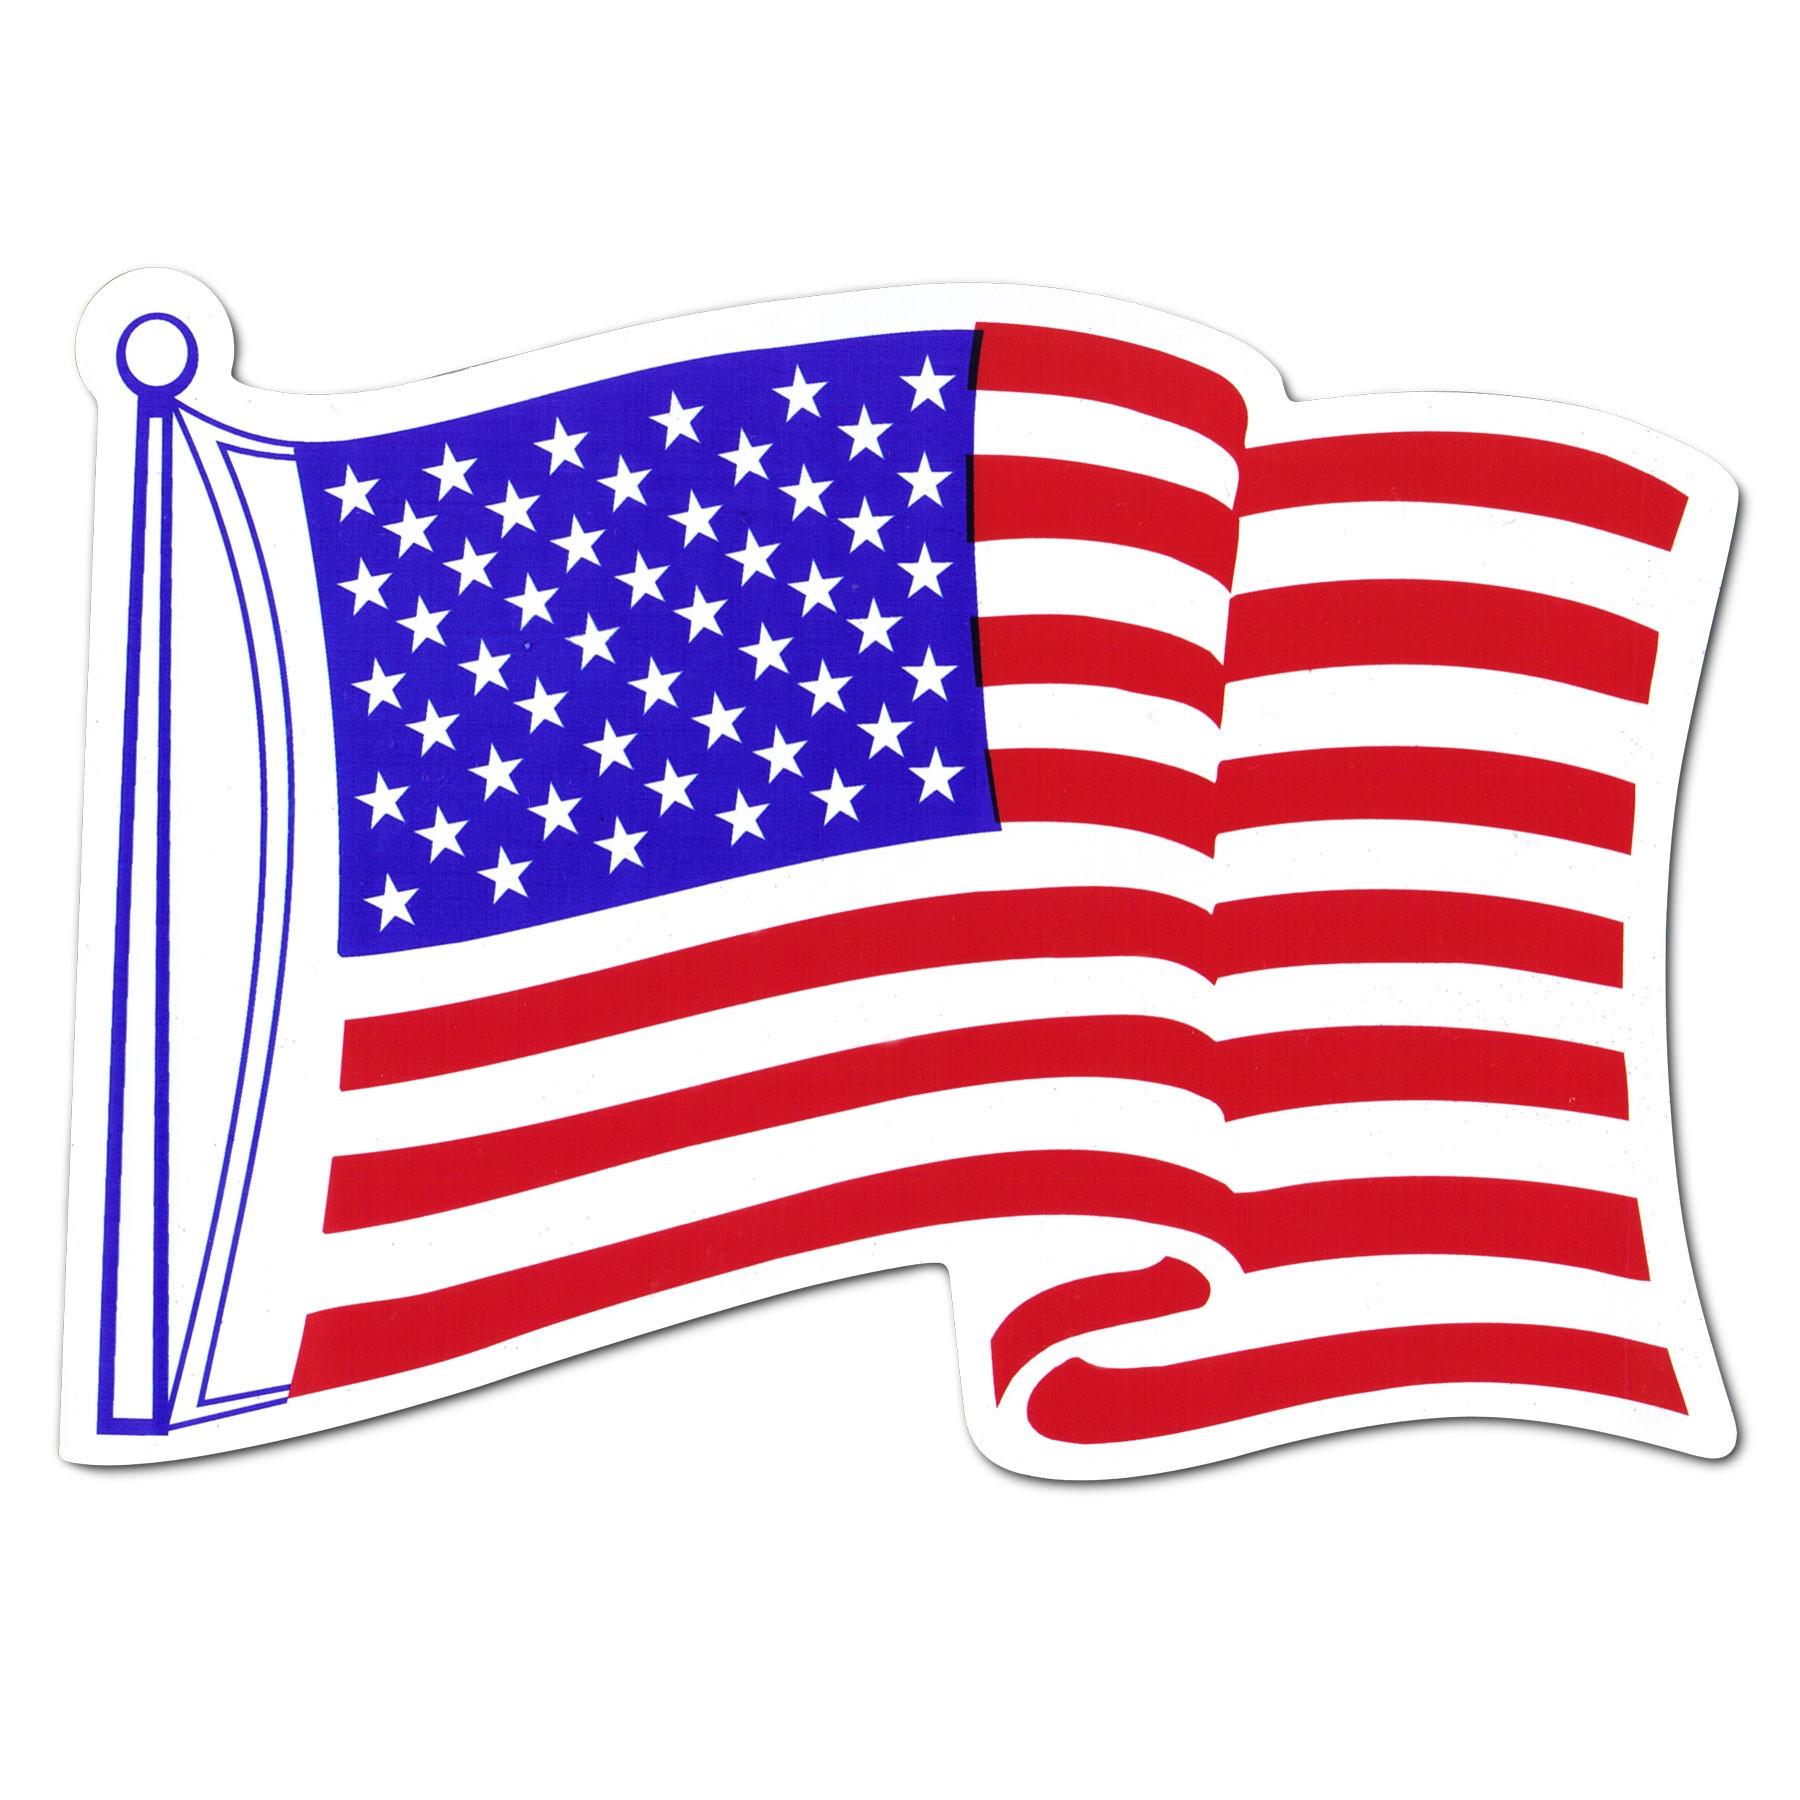 1800x1800 American Flag Clipart